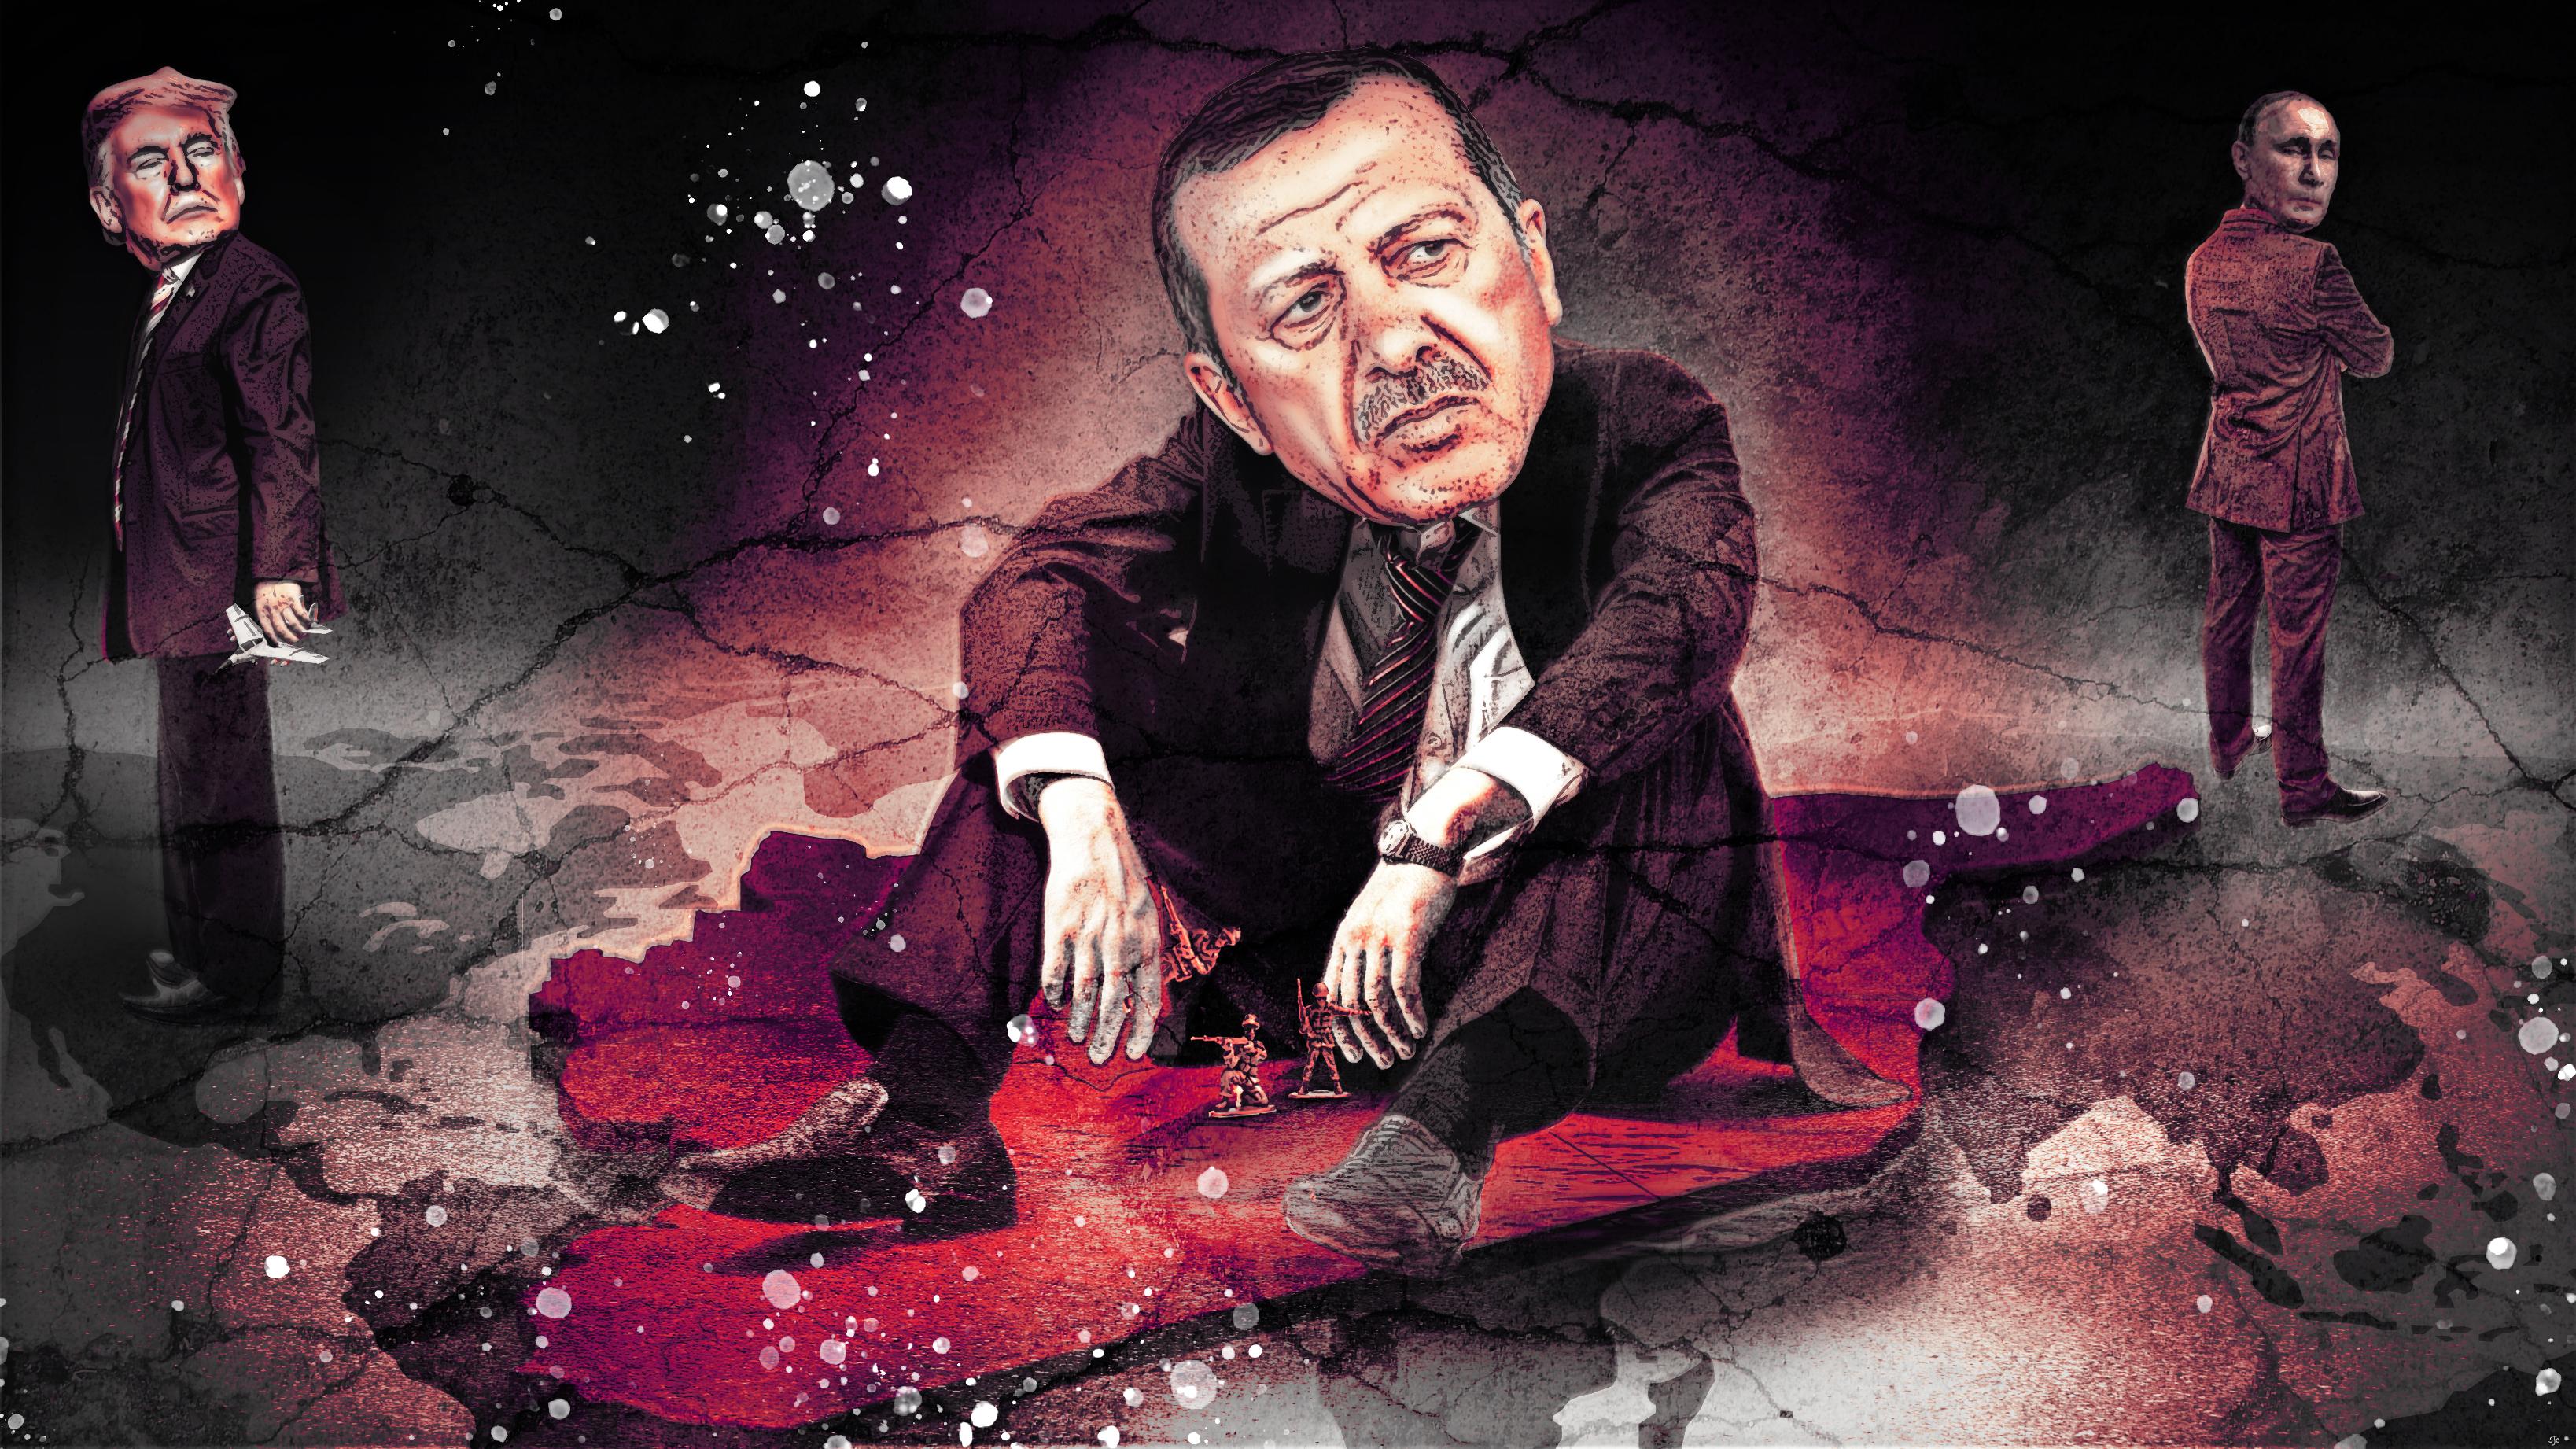 sjc_aa_erdoganv3